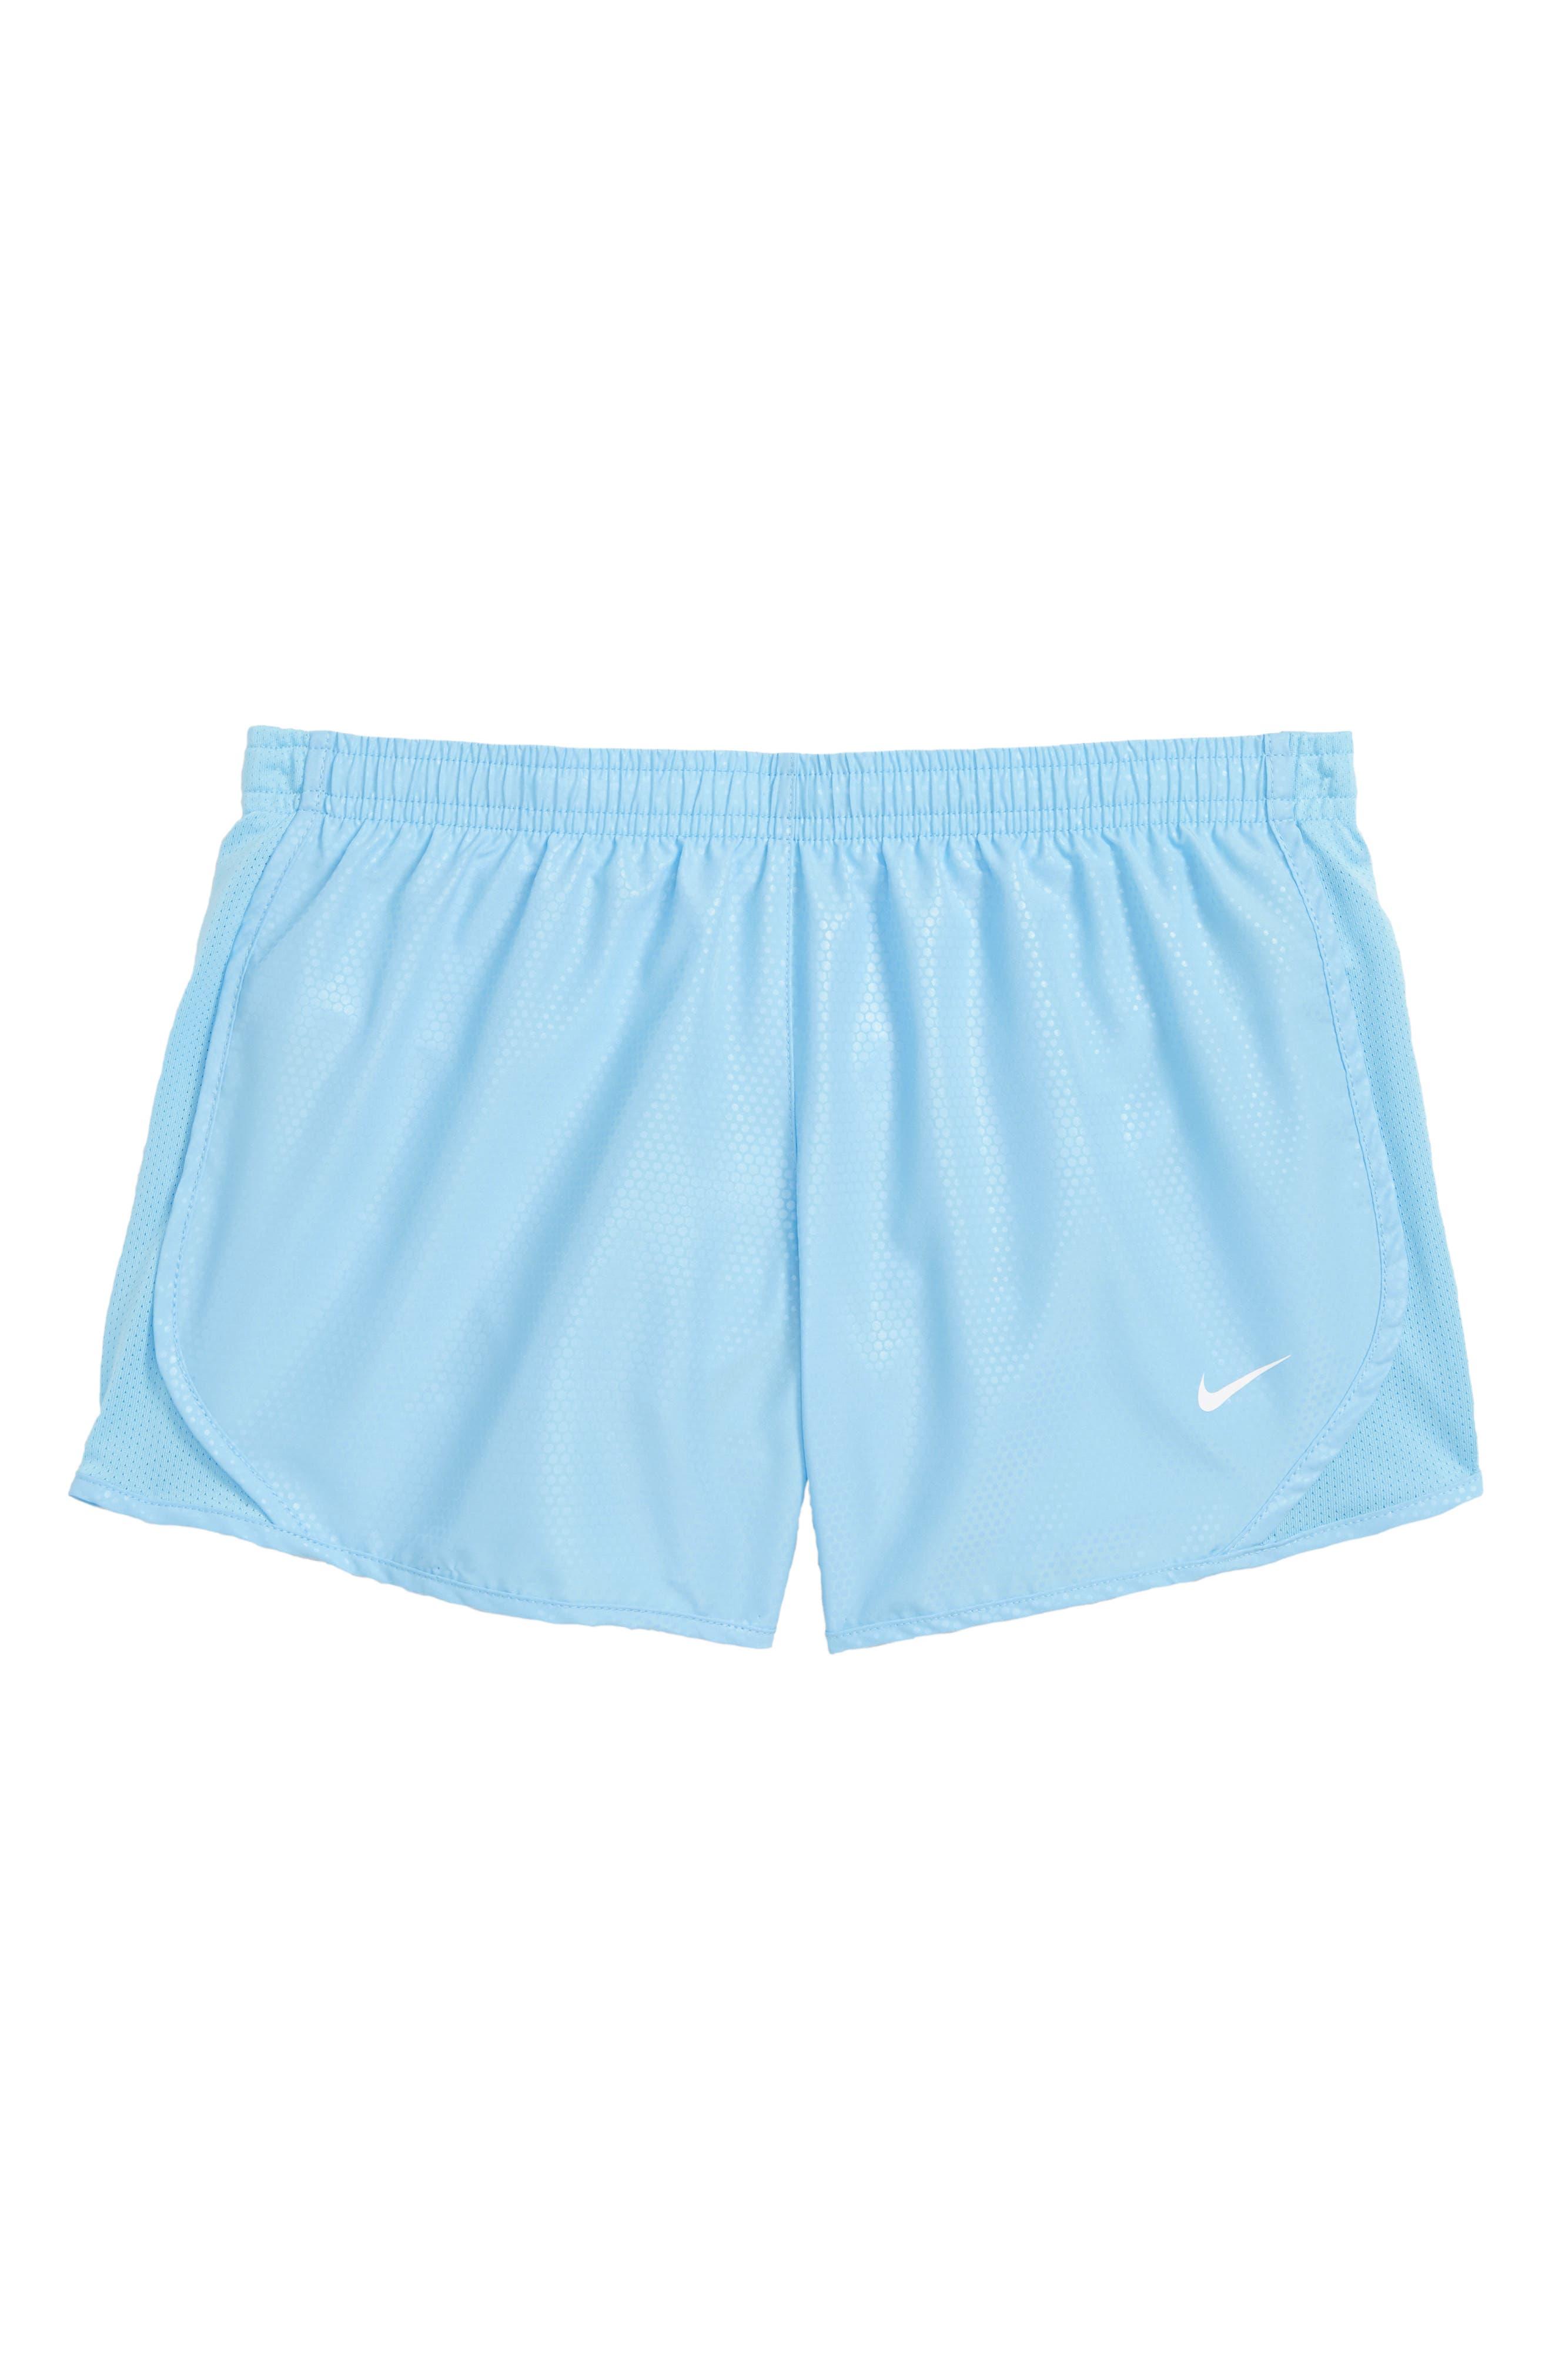 Dry Tempo Shorts,                         Main,                         color, Blue Chill/ White